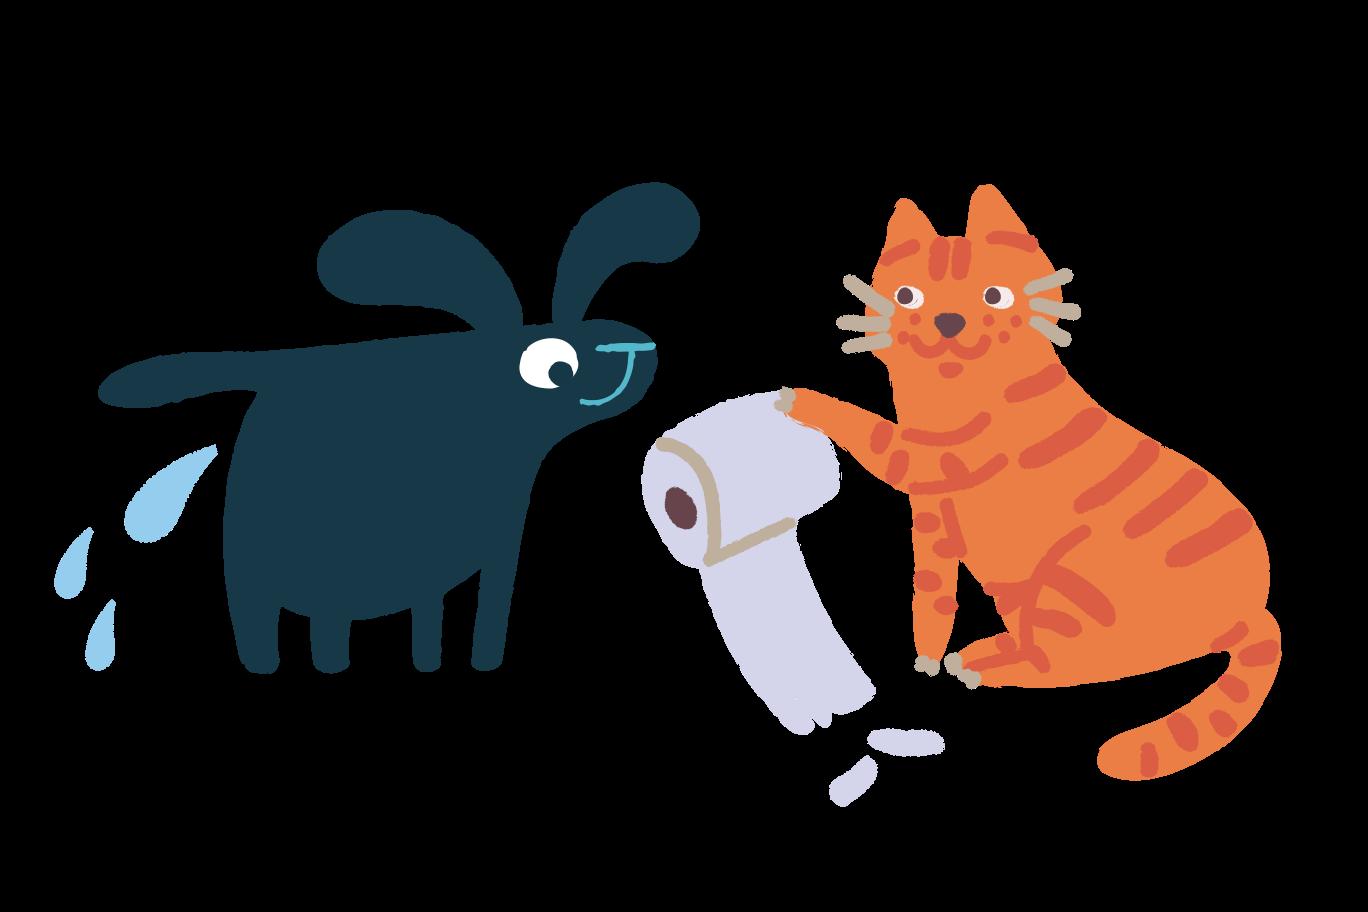 Help Clipart illustration in PNG, SVG